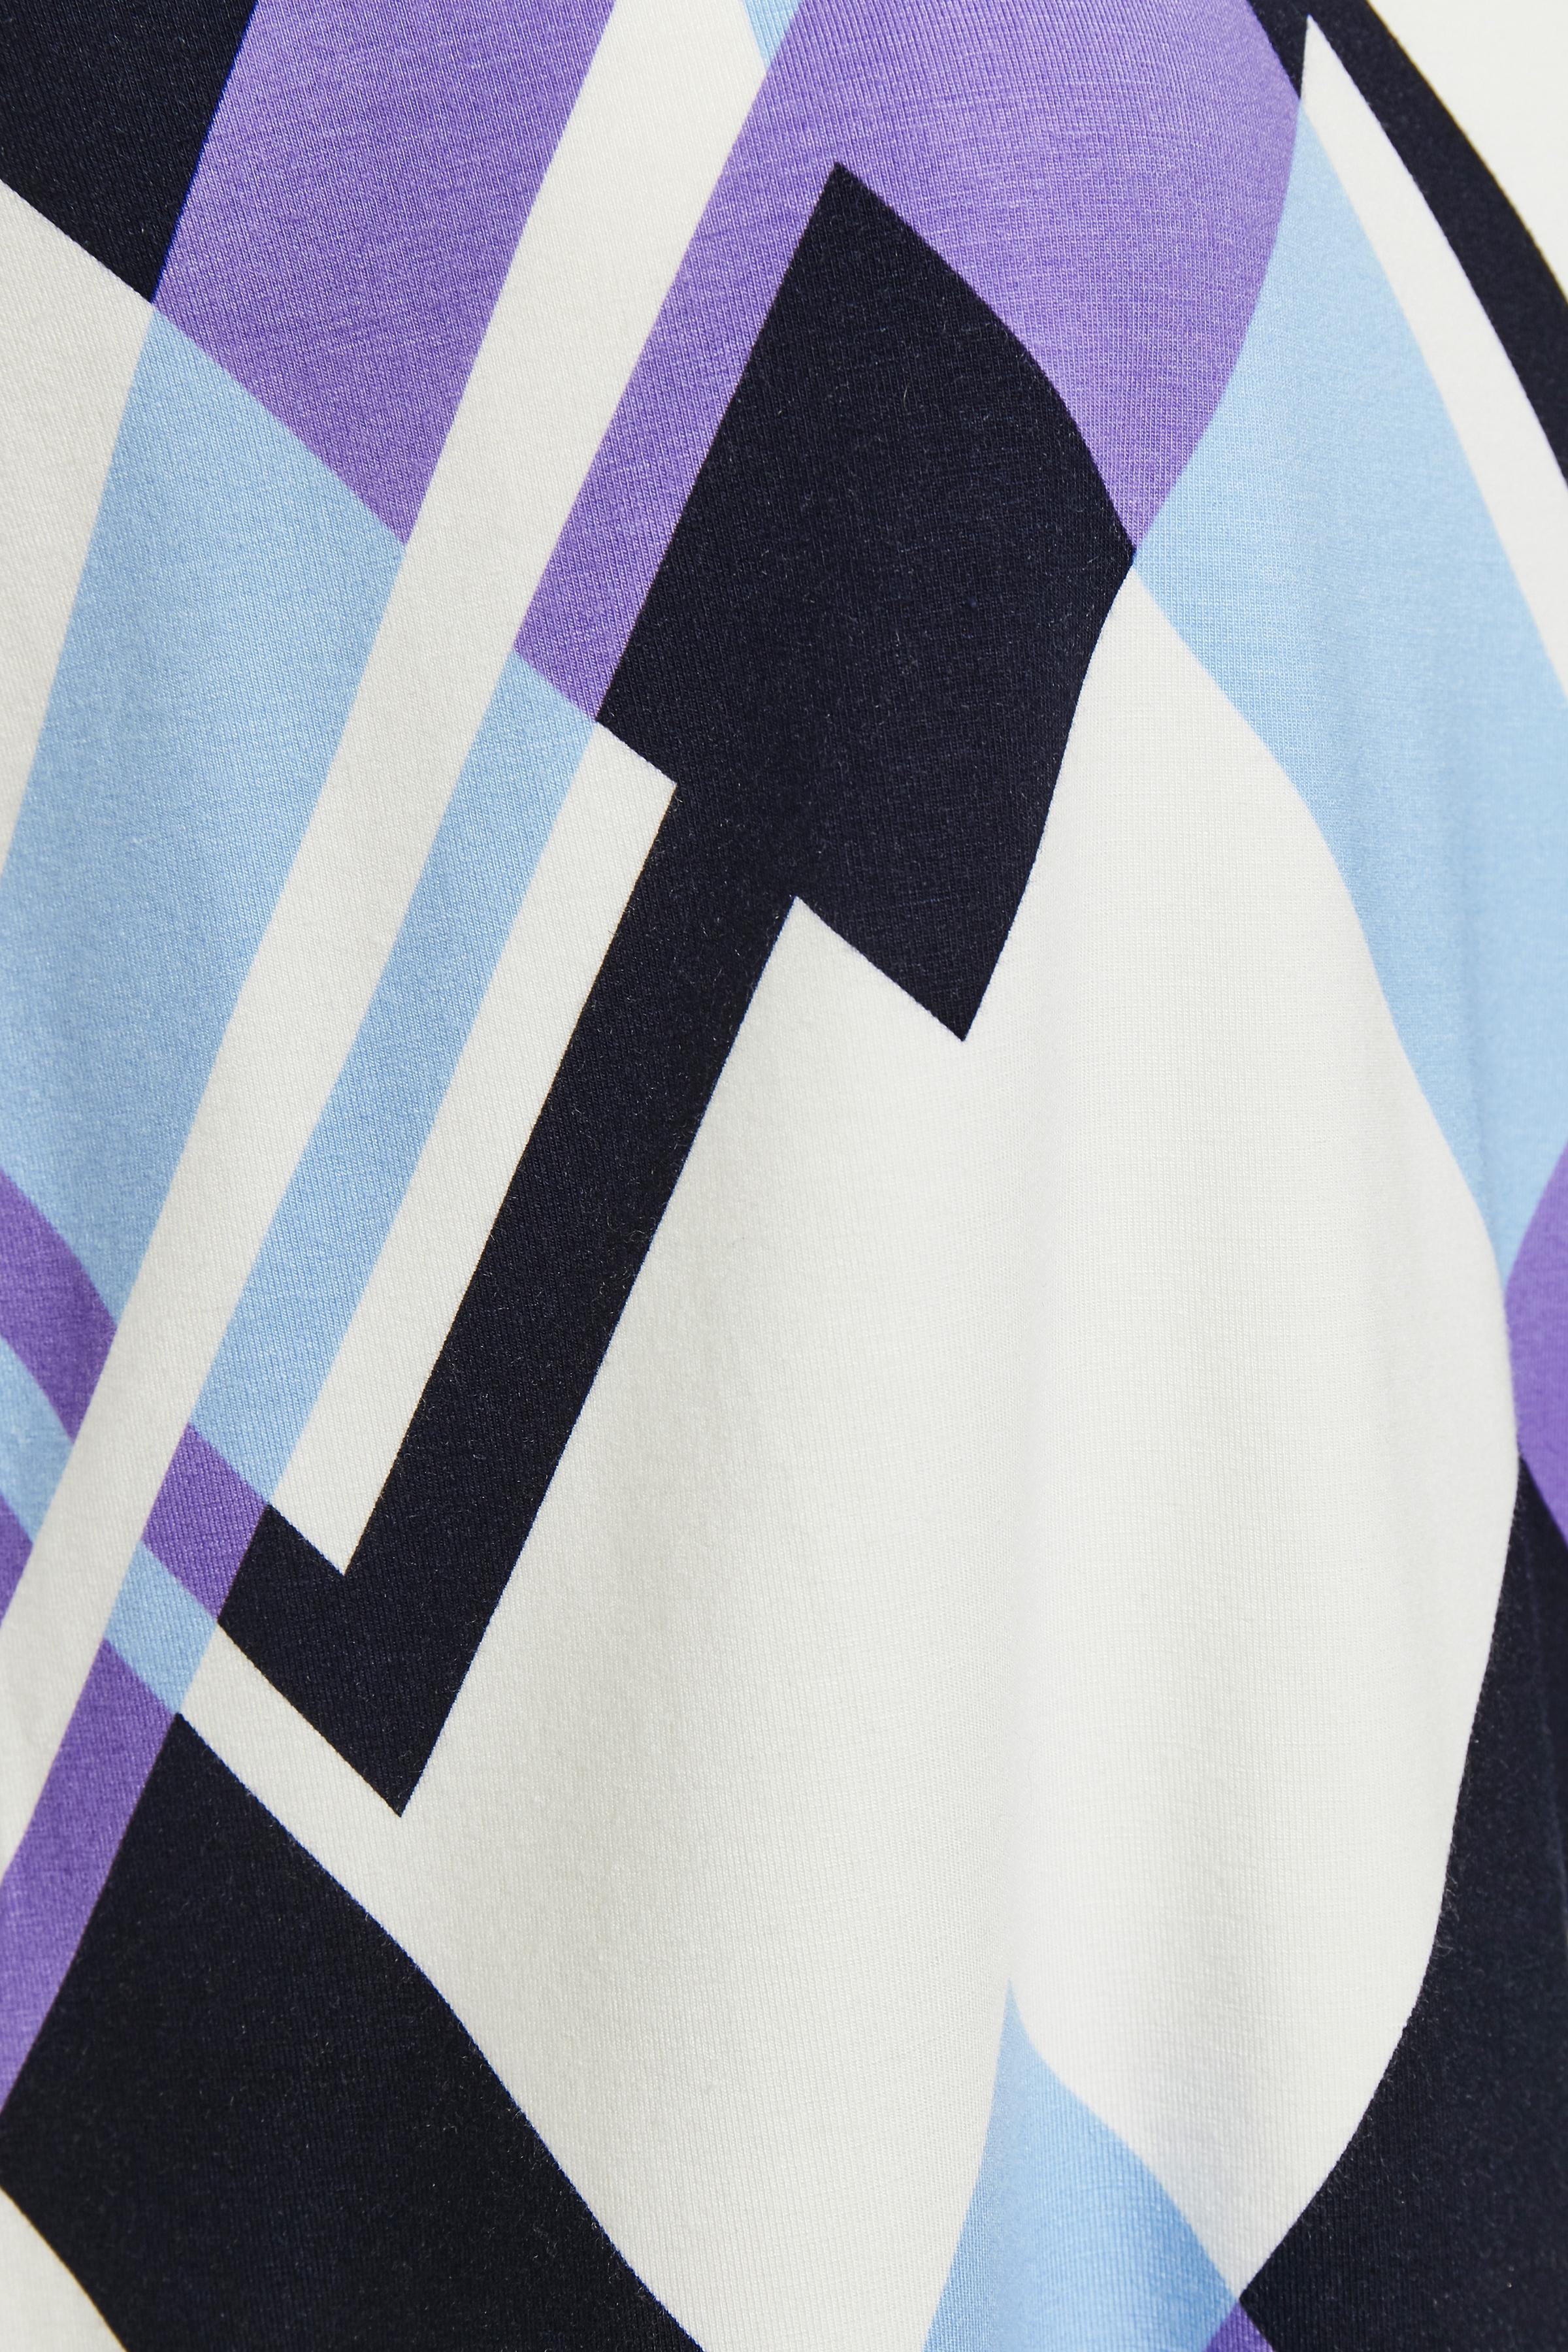 Weiß/lila Kurzarm-Shirt von Fransa – Shoppen Sie Weiß/lila Kurzarm-Shirt ab Gr. XS-XXL hier